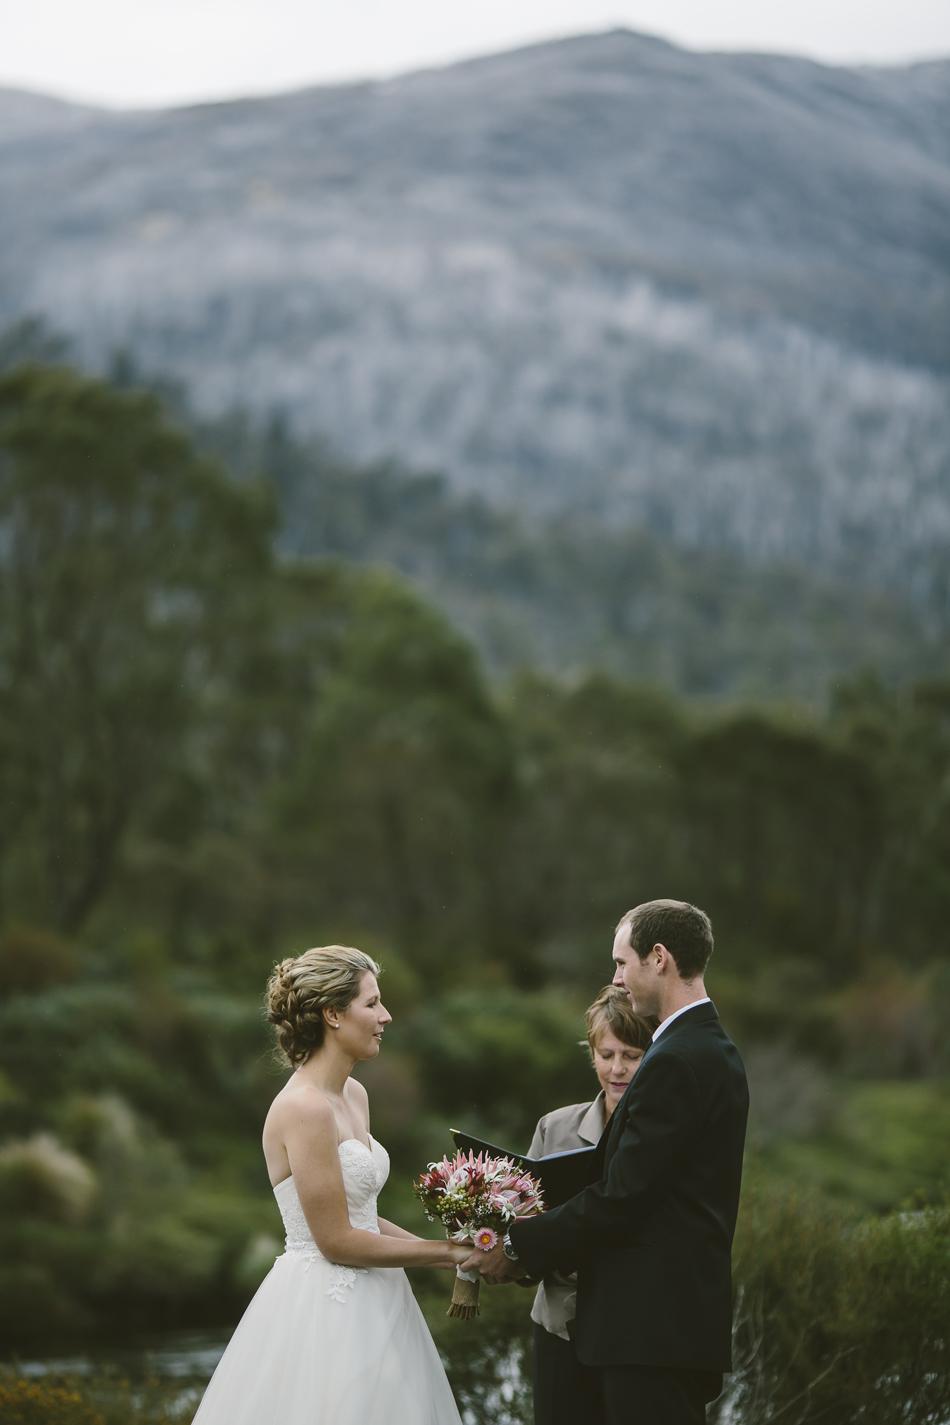 Outdoor wedding ceremony 24